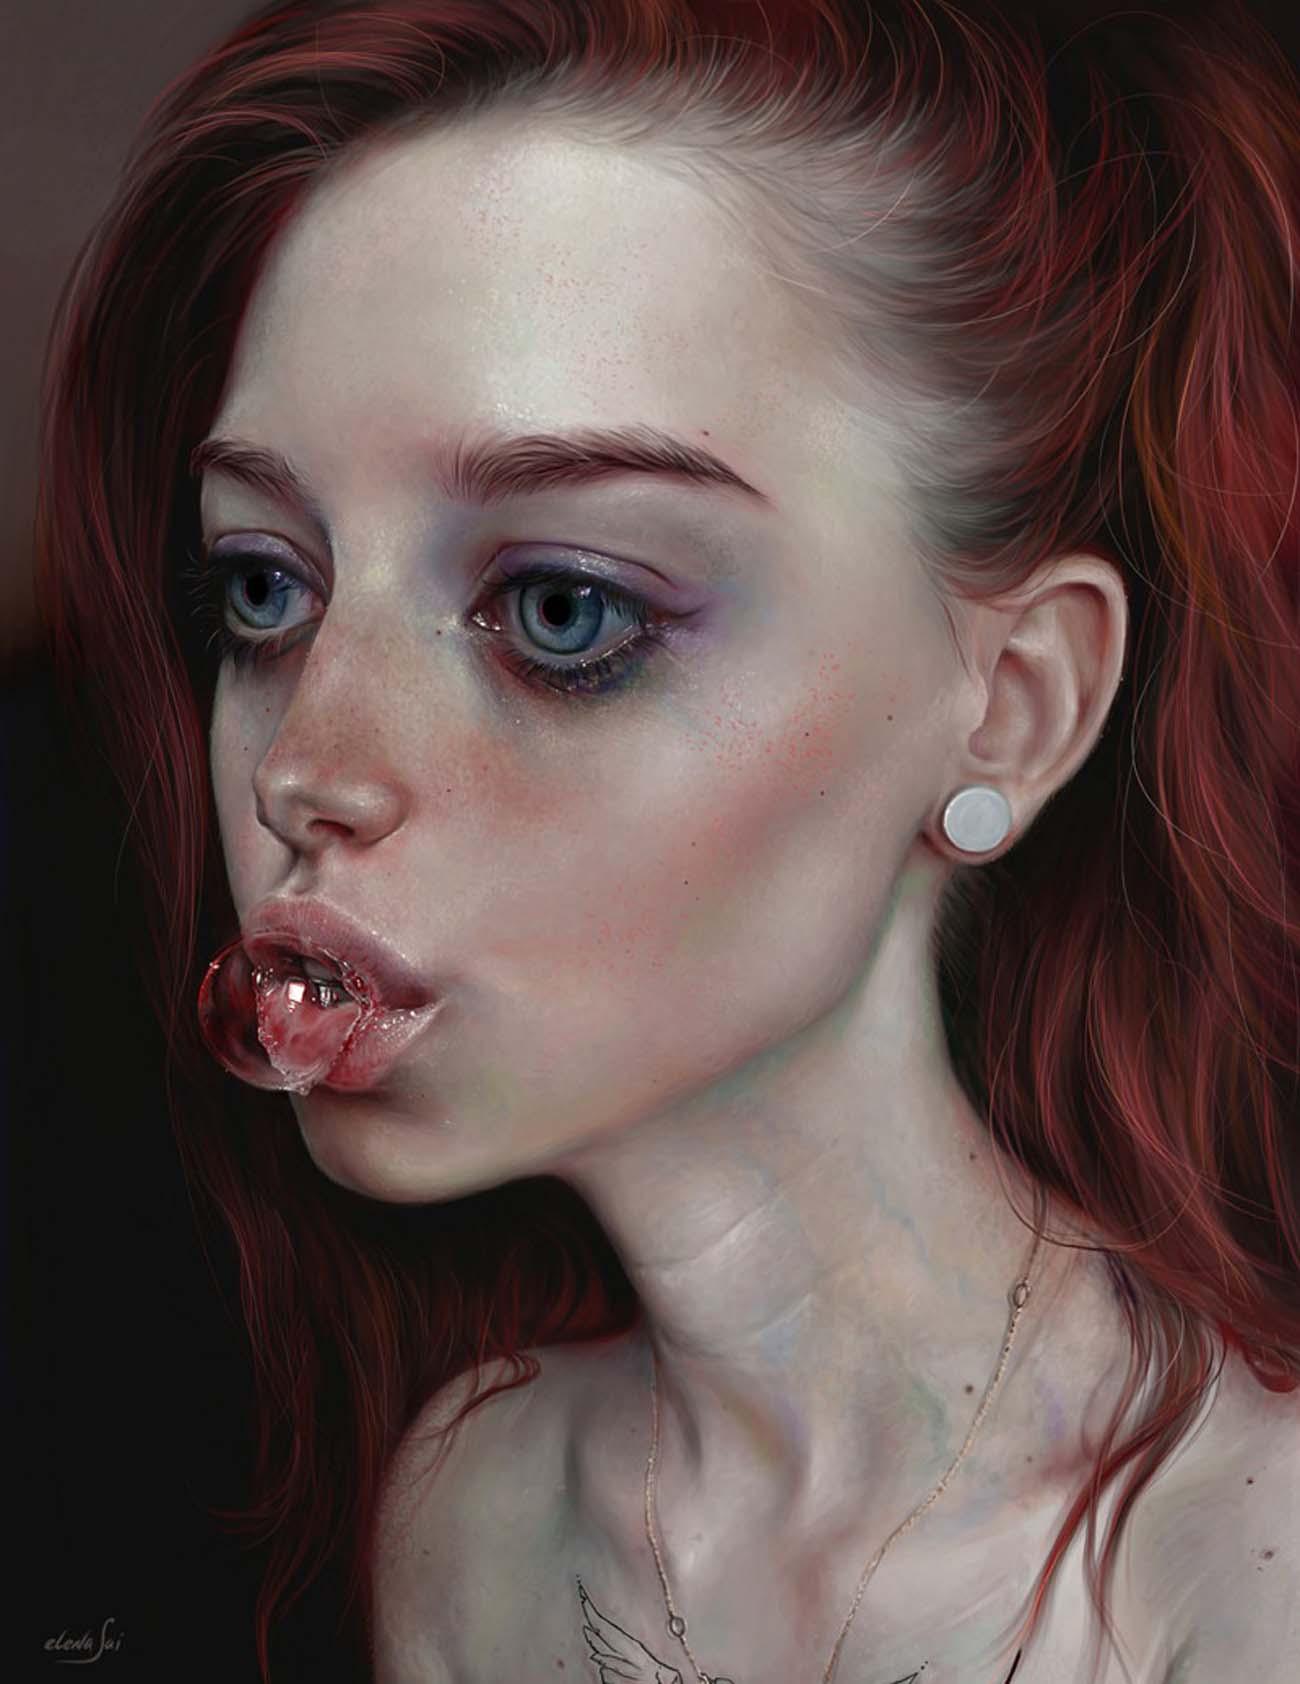 Elena Sai | Paintable.cc Digital Painting Inspiration - Learn the Art of Digital Painting! #digitalpainting #digitalart